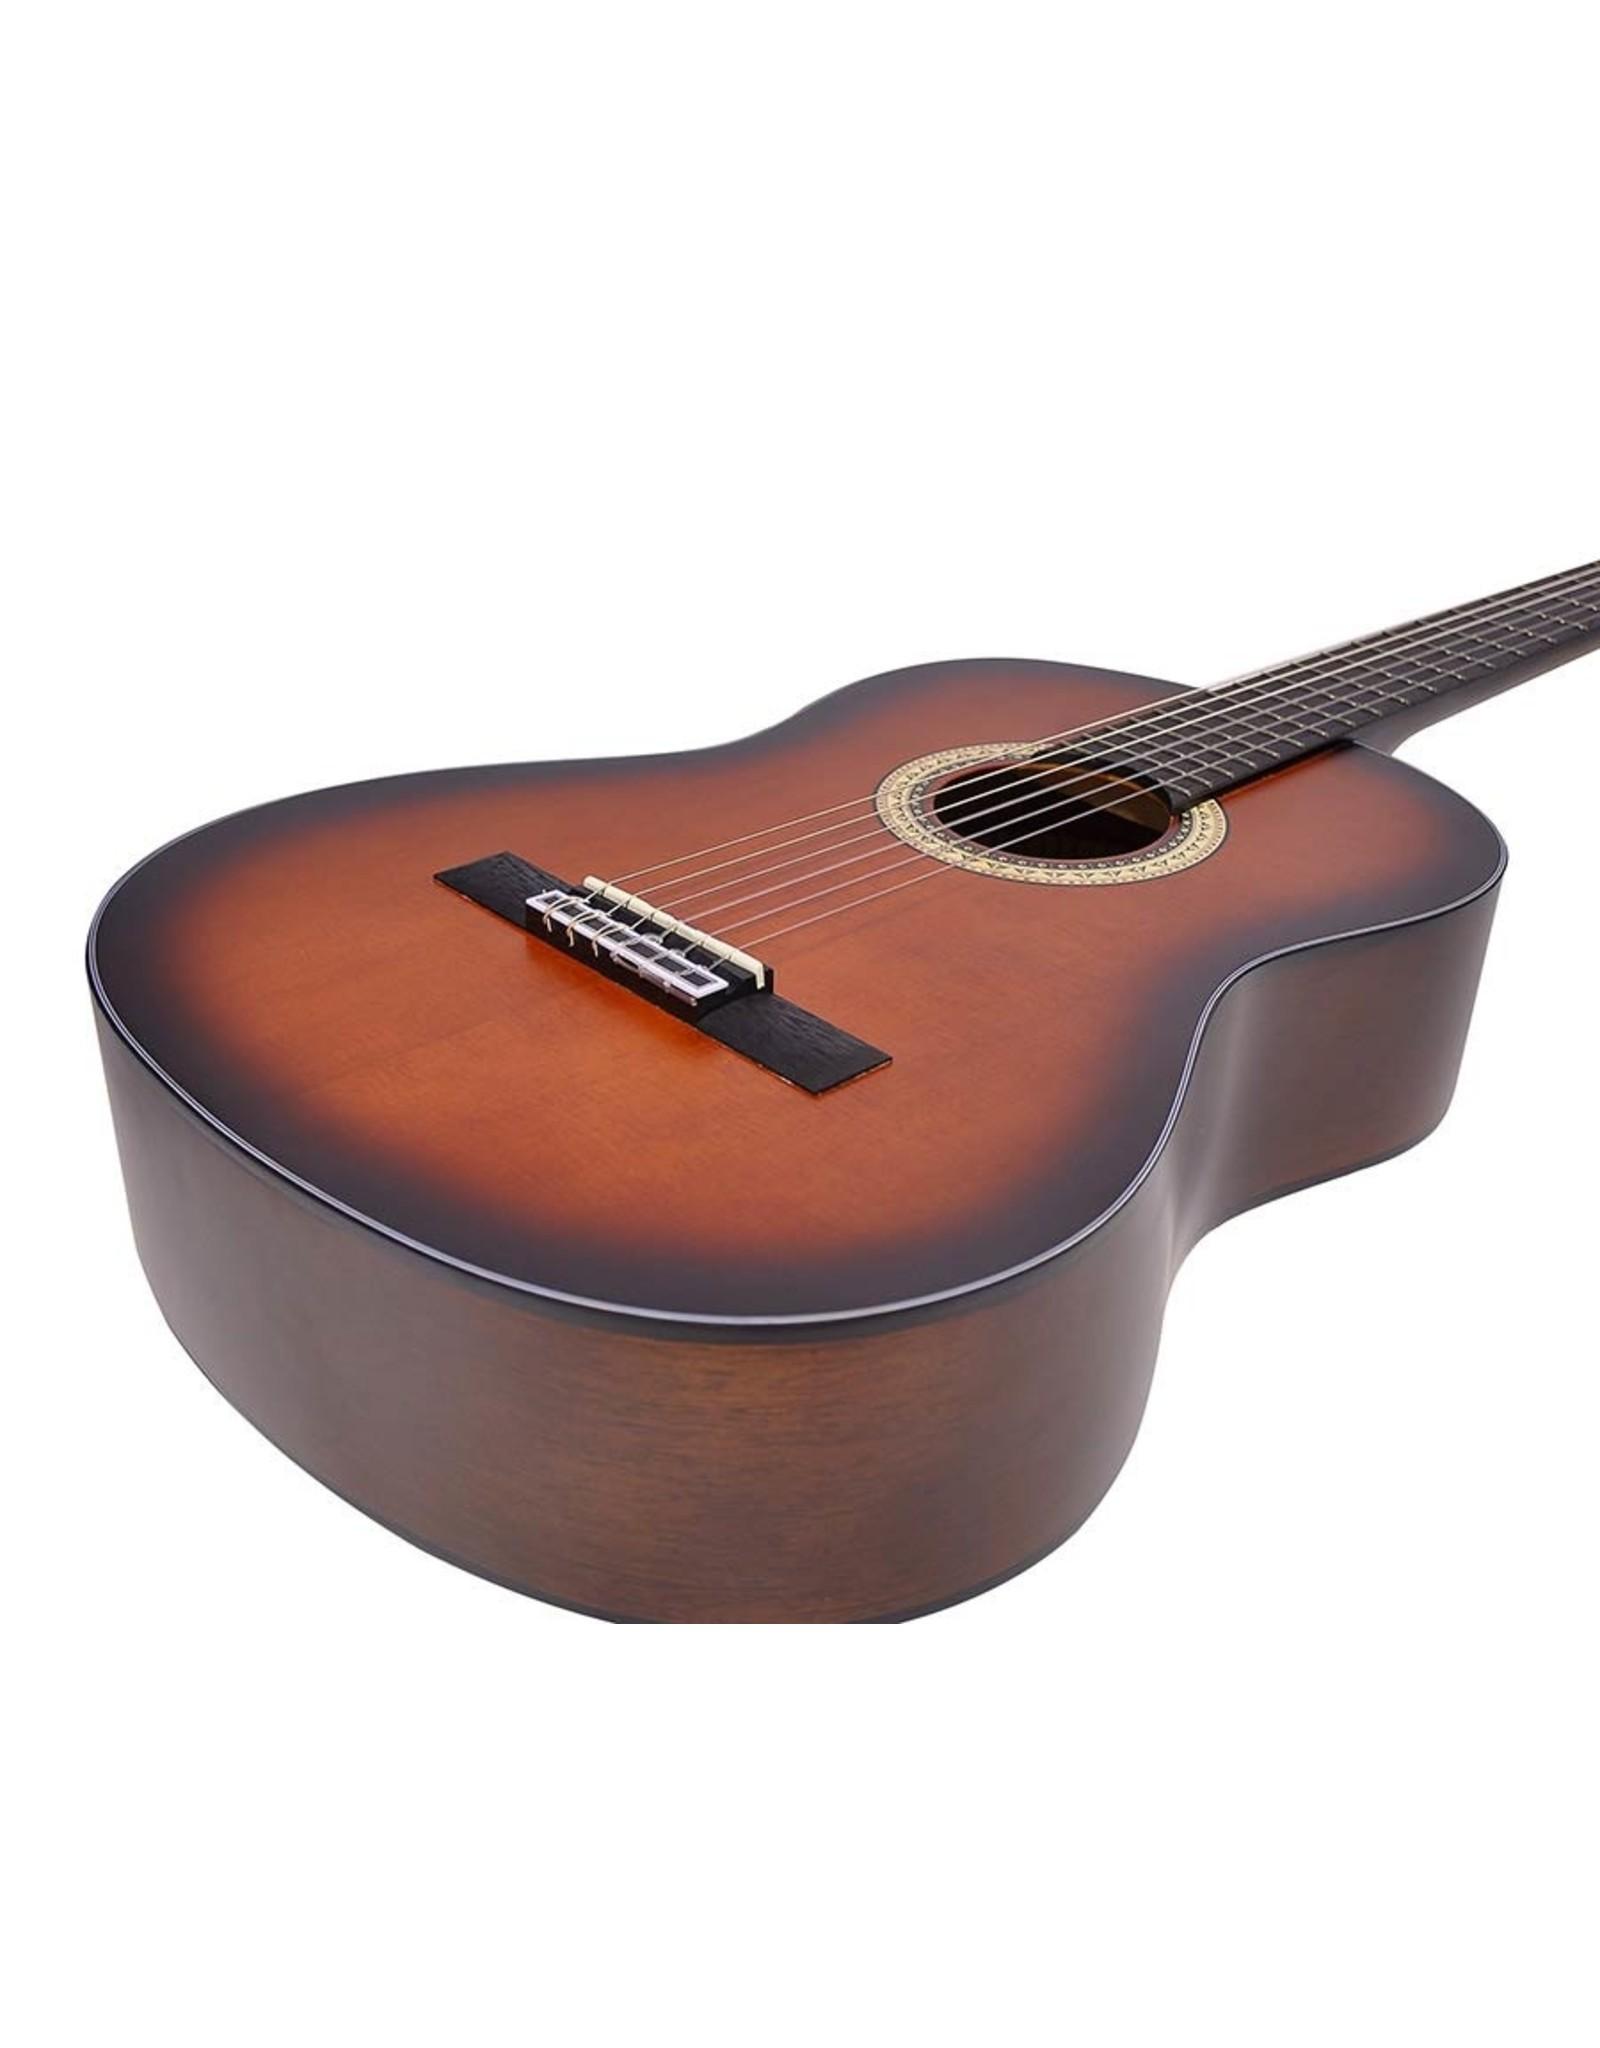 Valencia VC404/CSB| Valencia Series 400 klassieke gitaar